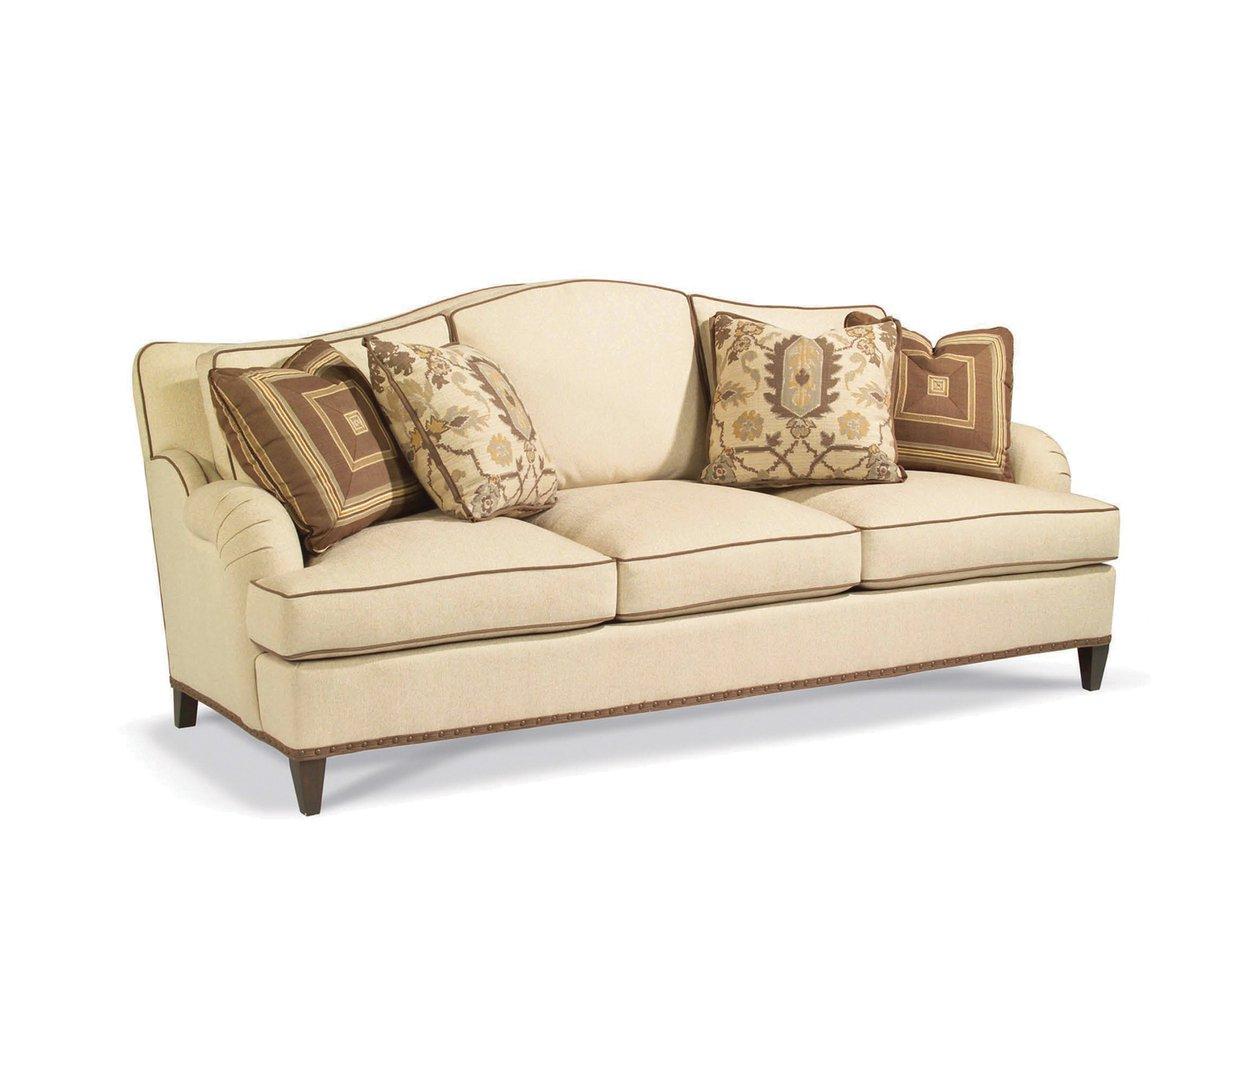 Hedley Sofa Image